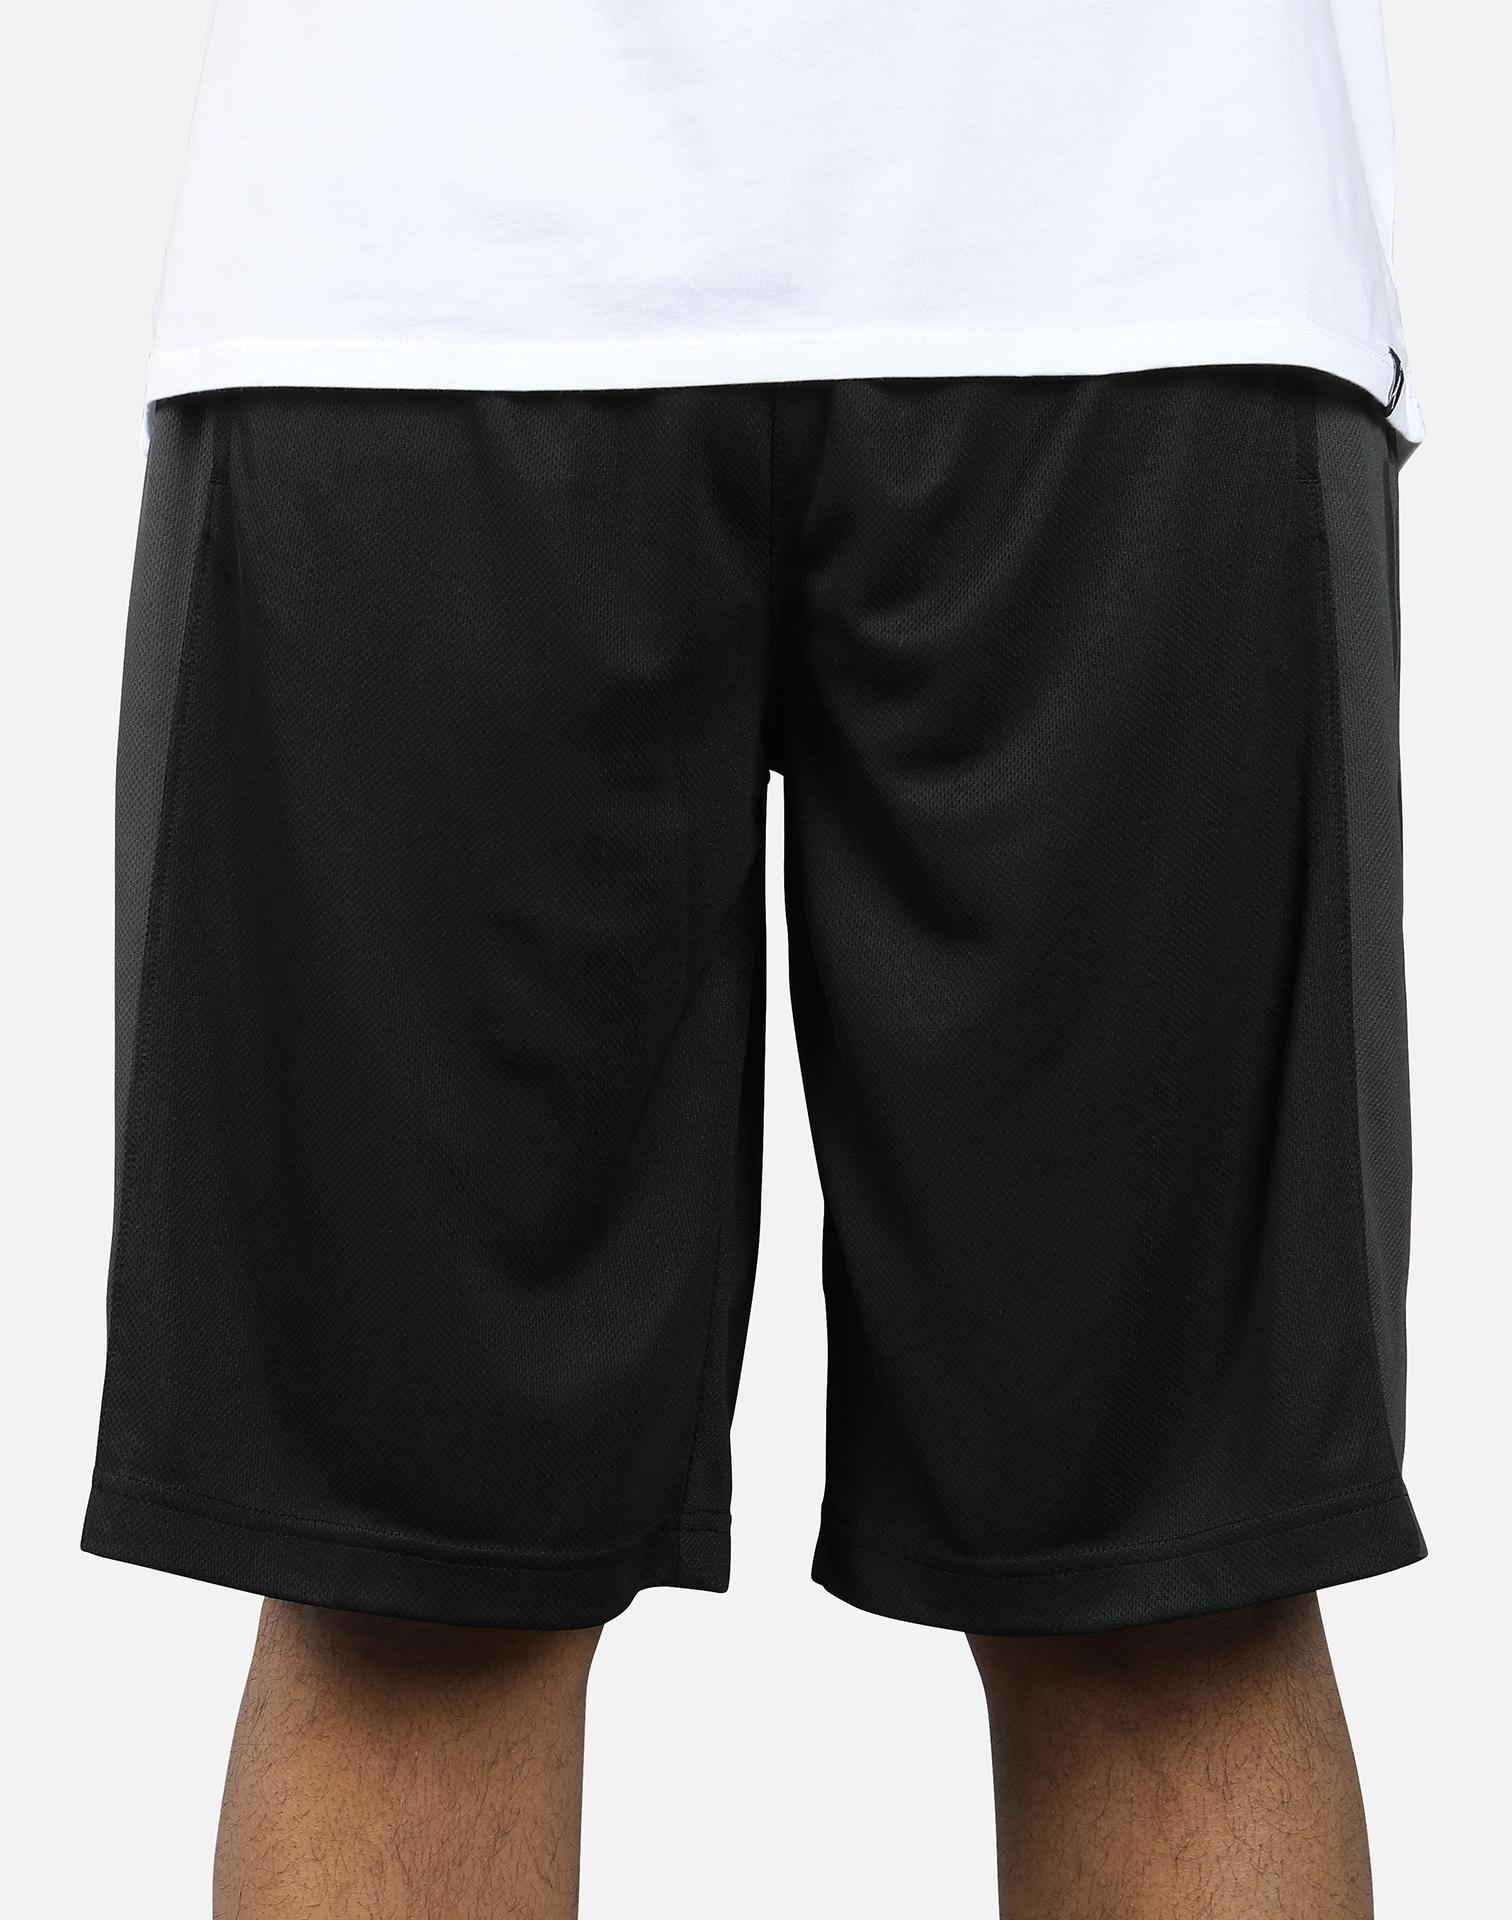 5c2afea13961 Lyst - Nike Aj10 Basketball Shorts in Black for Men